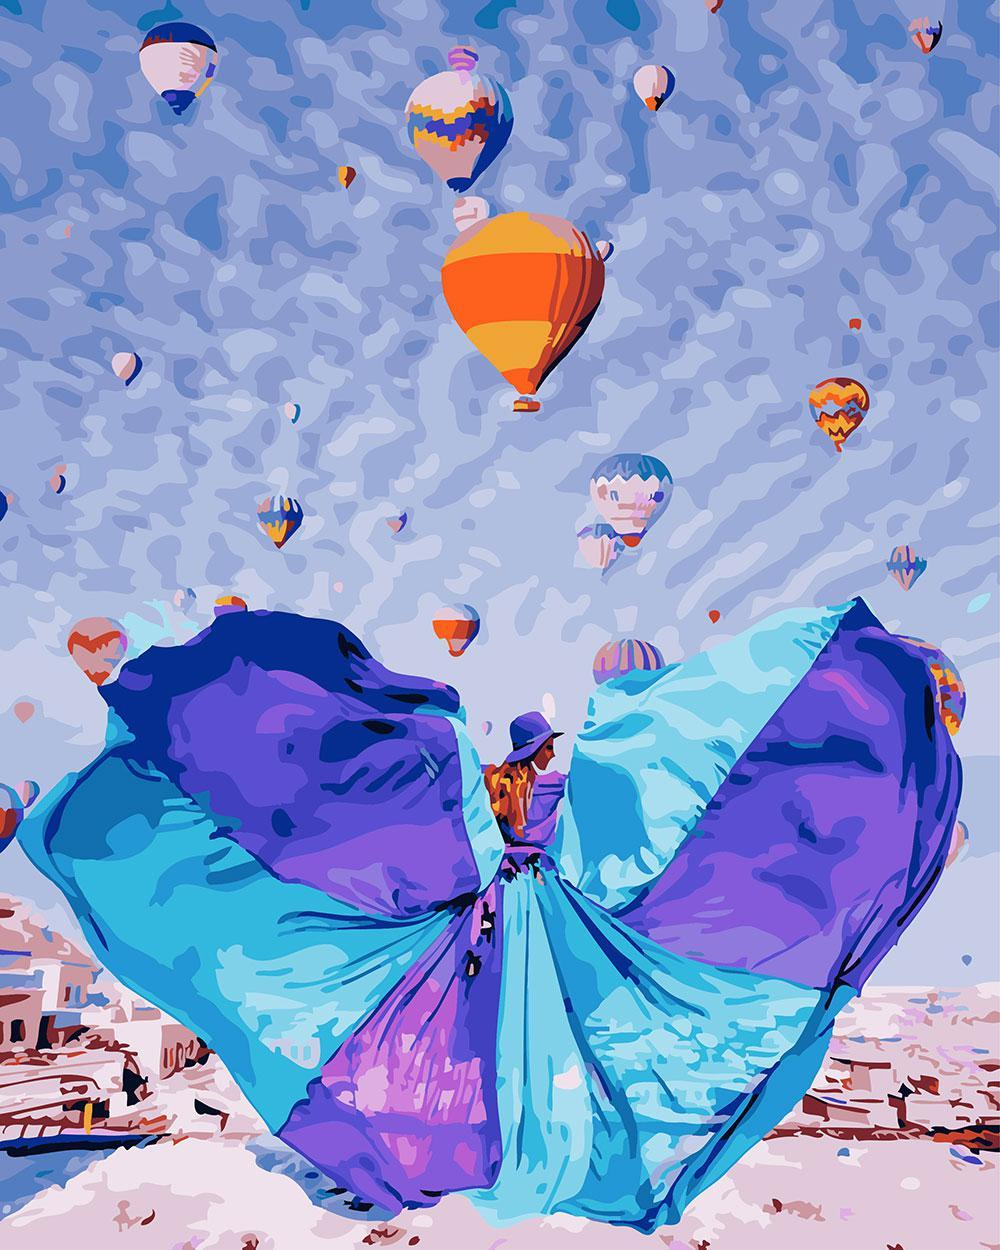 Картина по номерам Летние мечты 40 х 50 см (BRM24906)